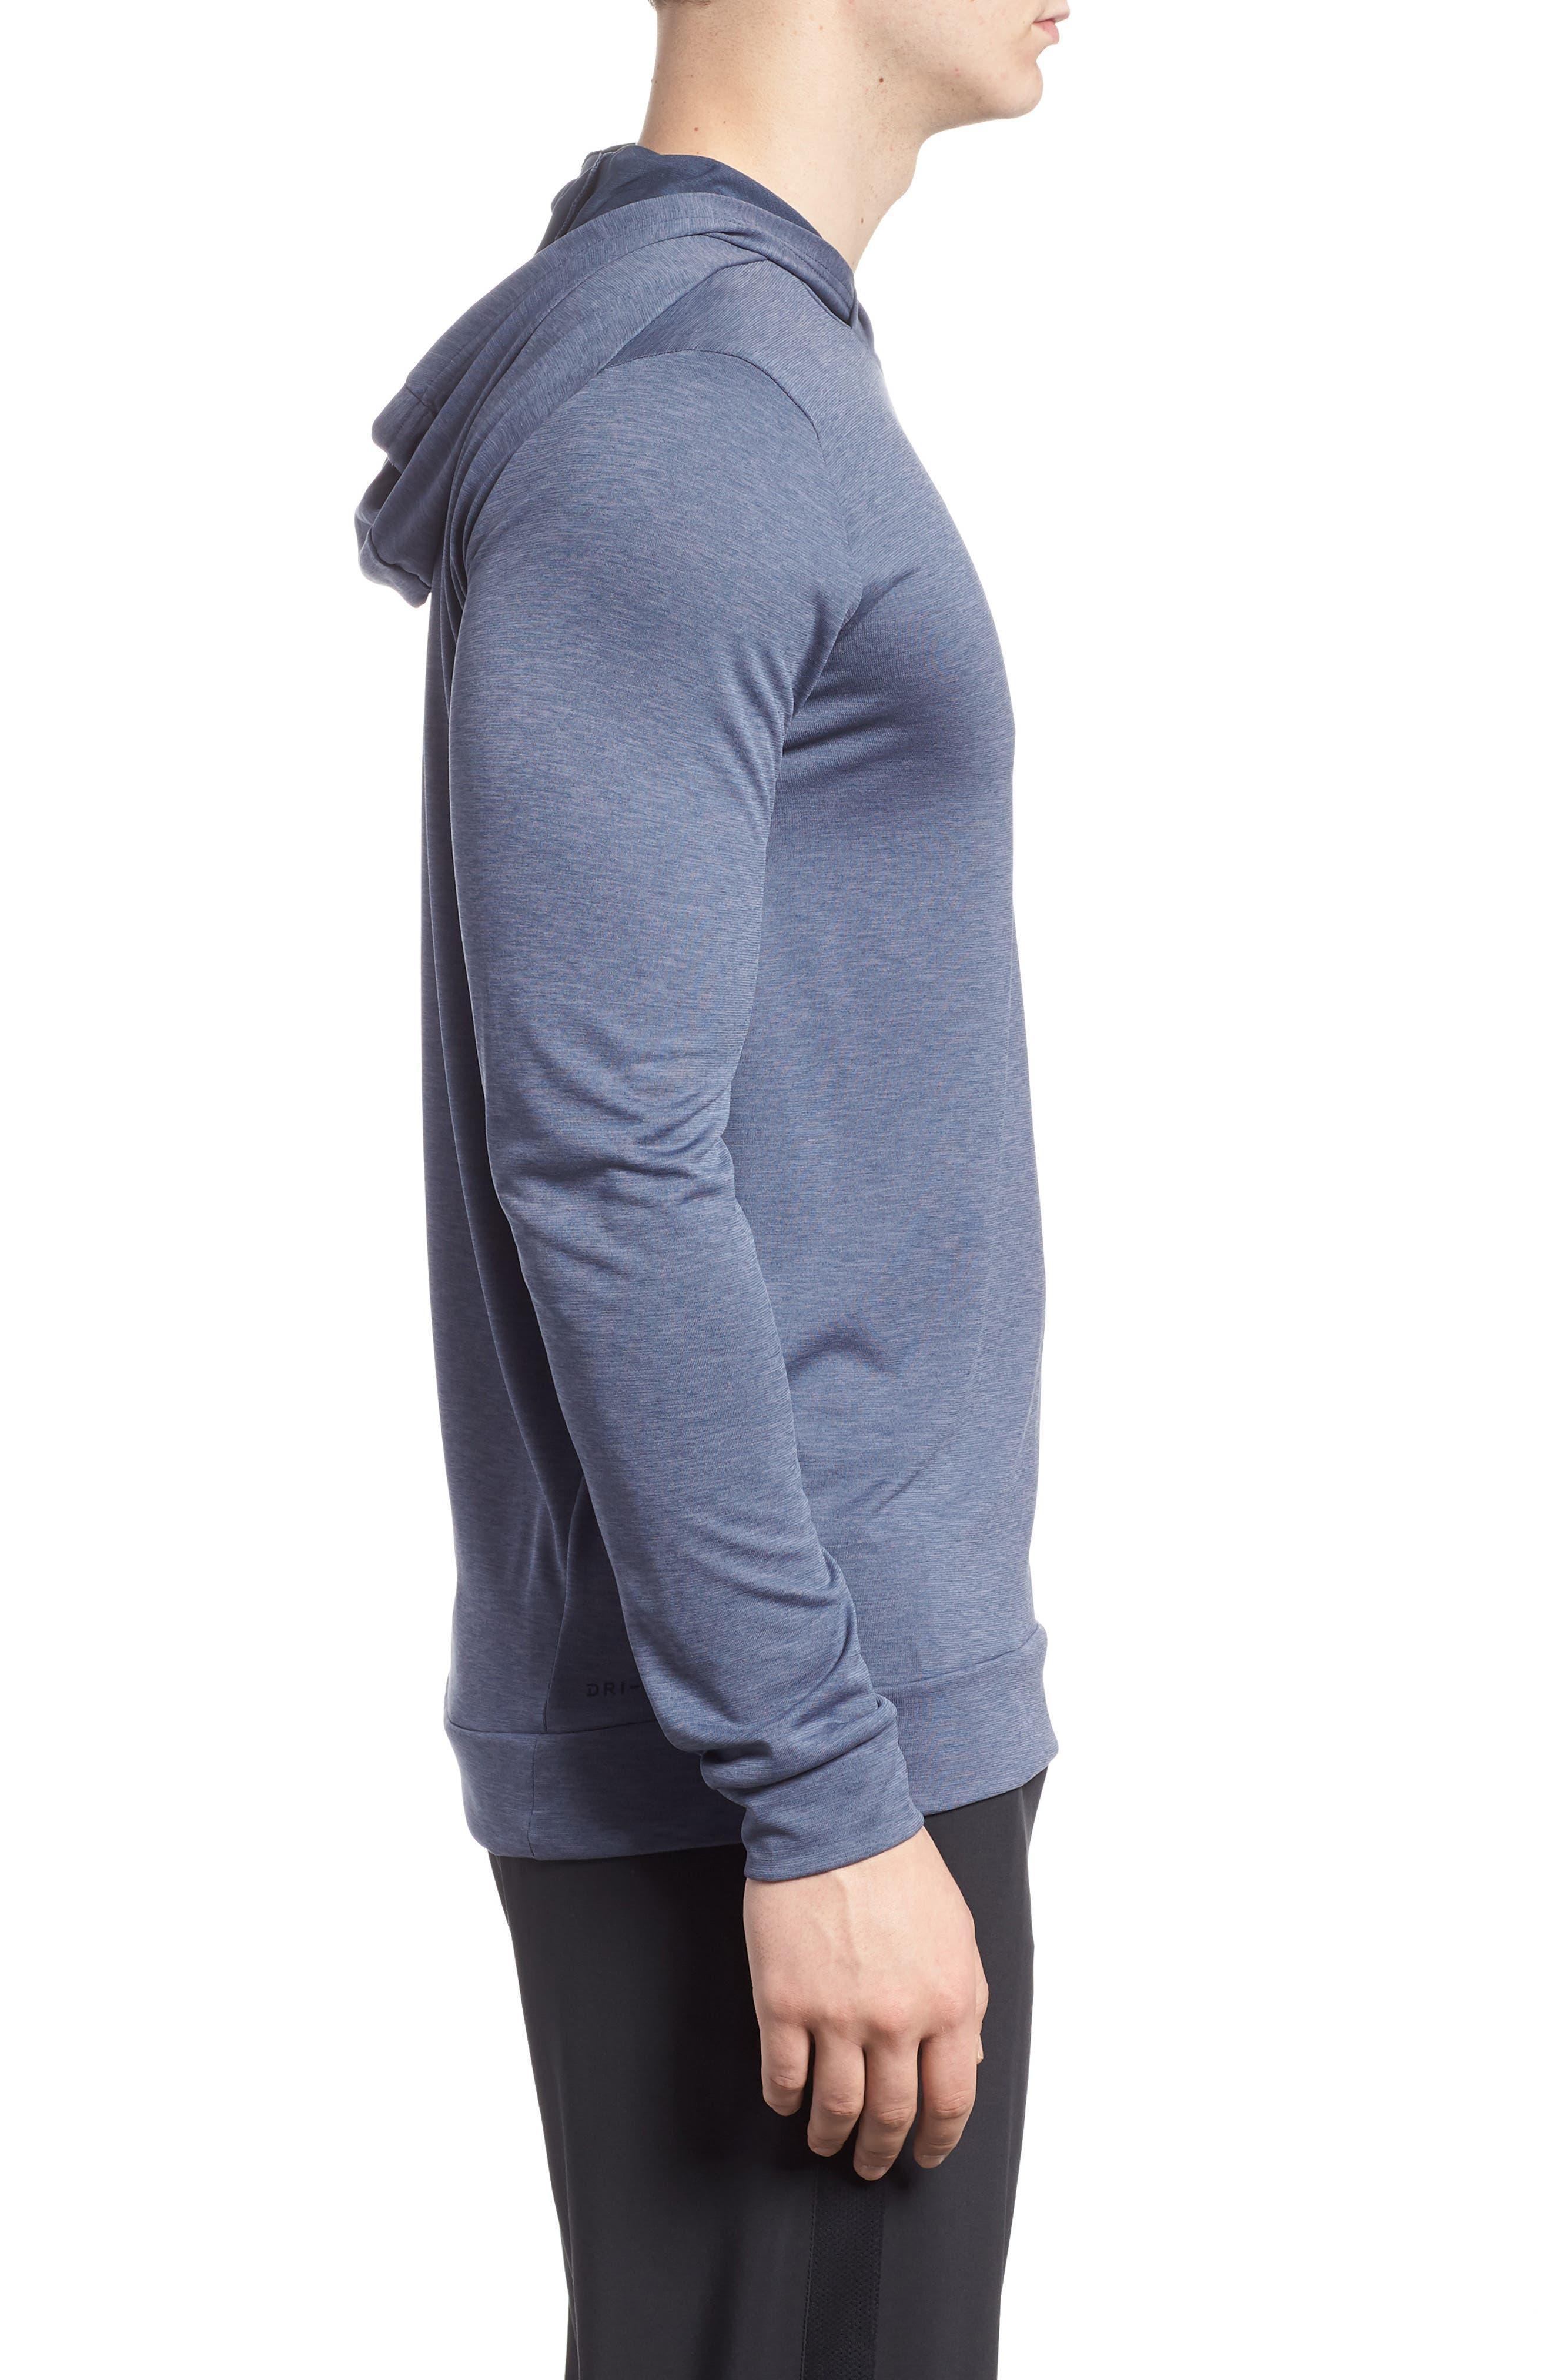 NIKE,                             Hyper Dry Regular Fit Training Hoodie,                             Alternate thumbnail 3, color,                             021